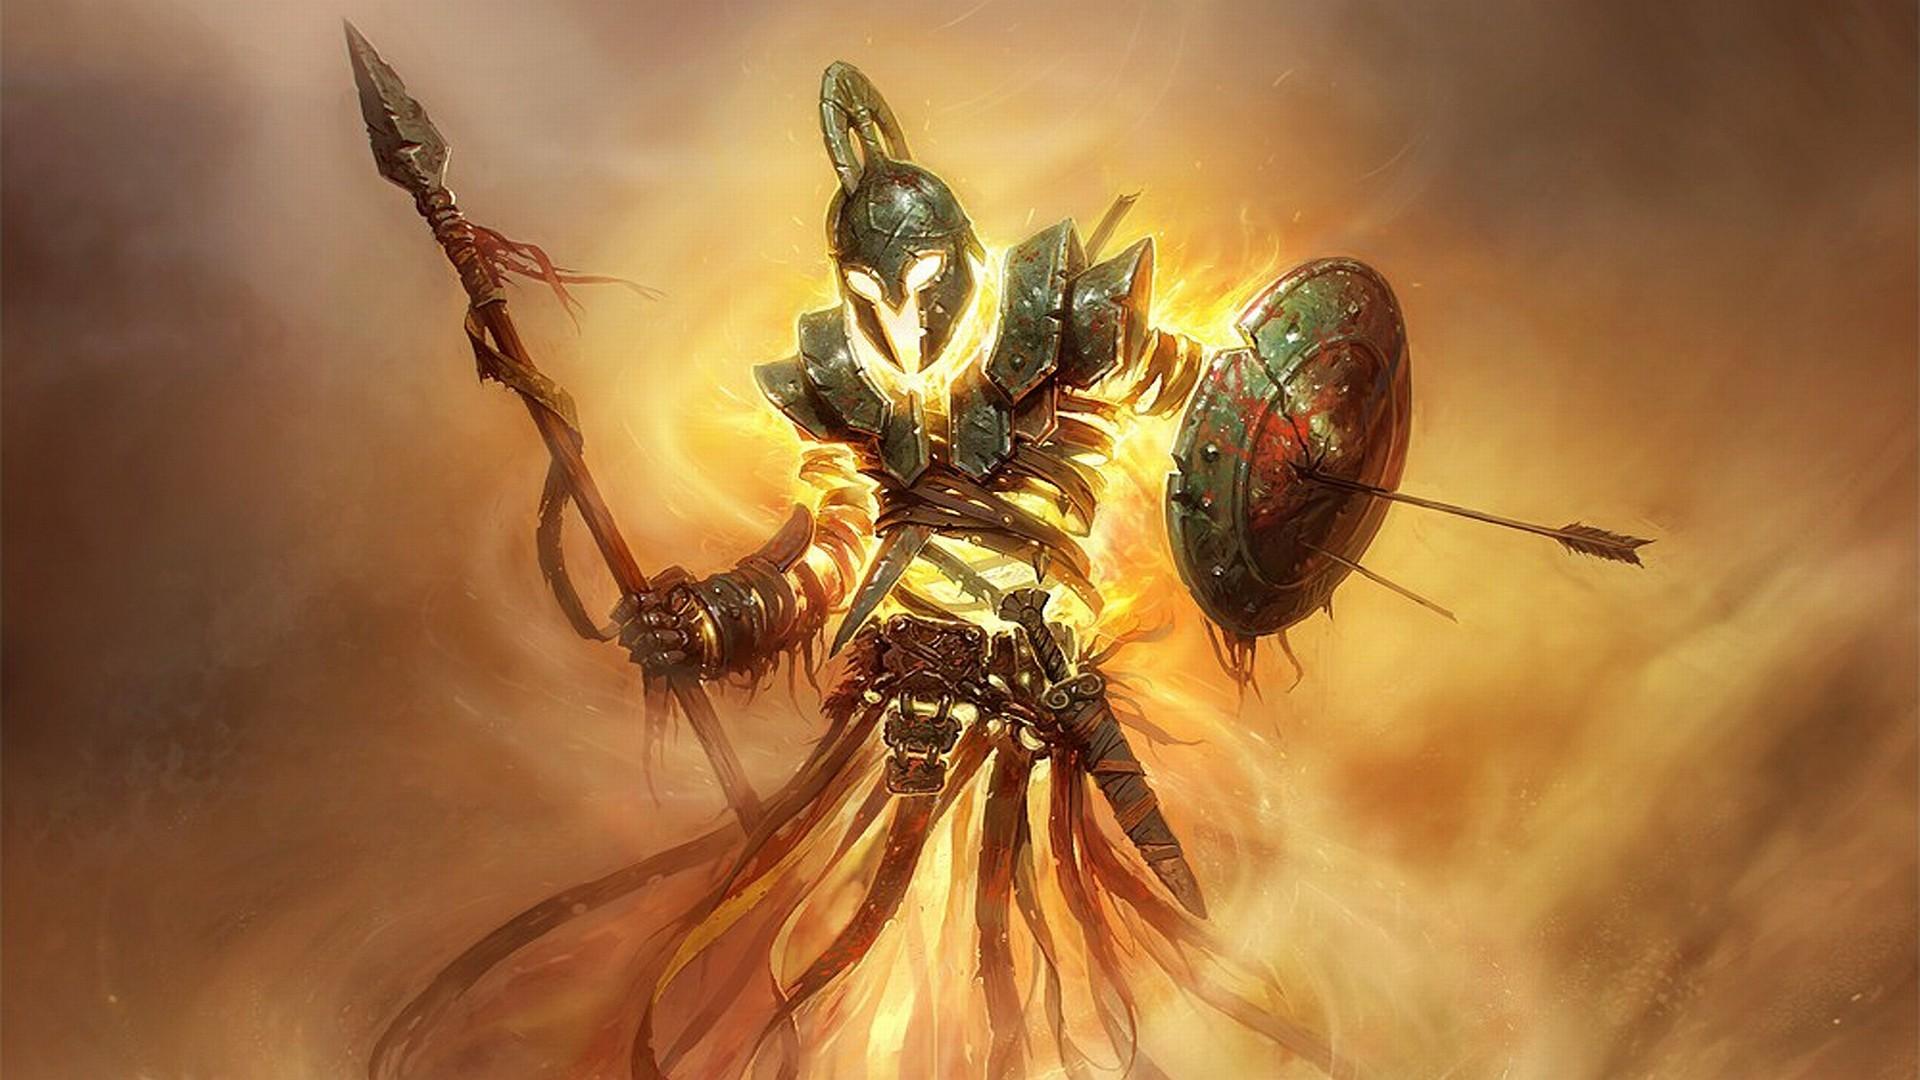 General 1920x1080 warrior fantasy art Armored spear shield